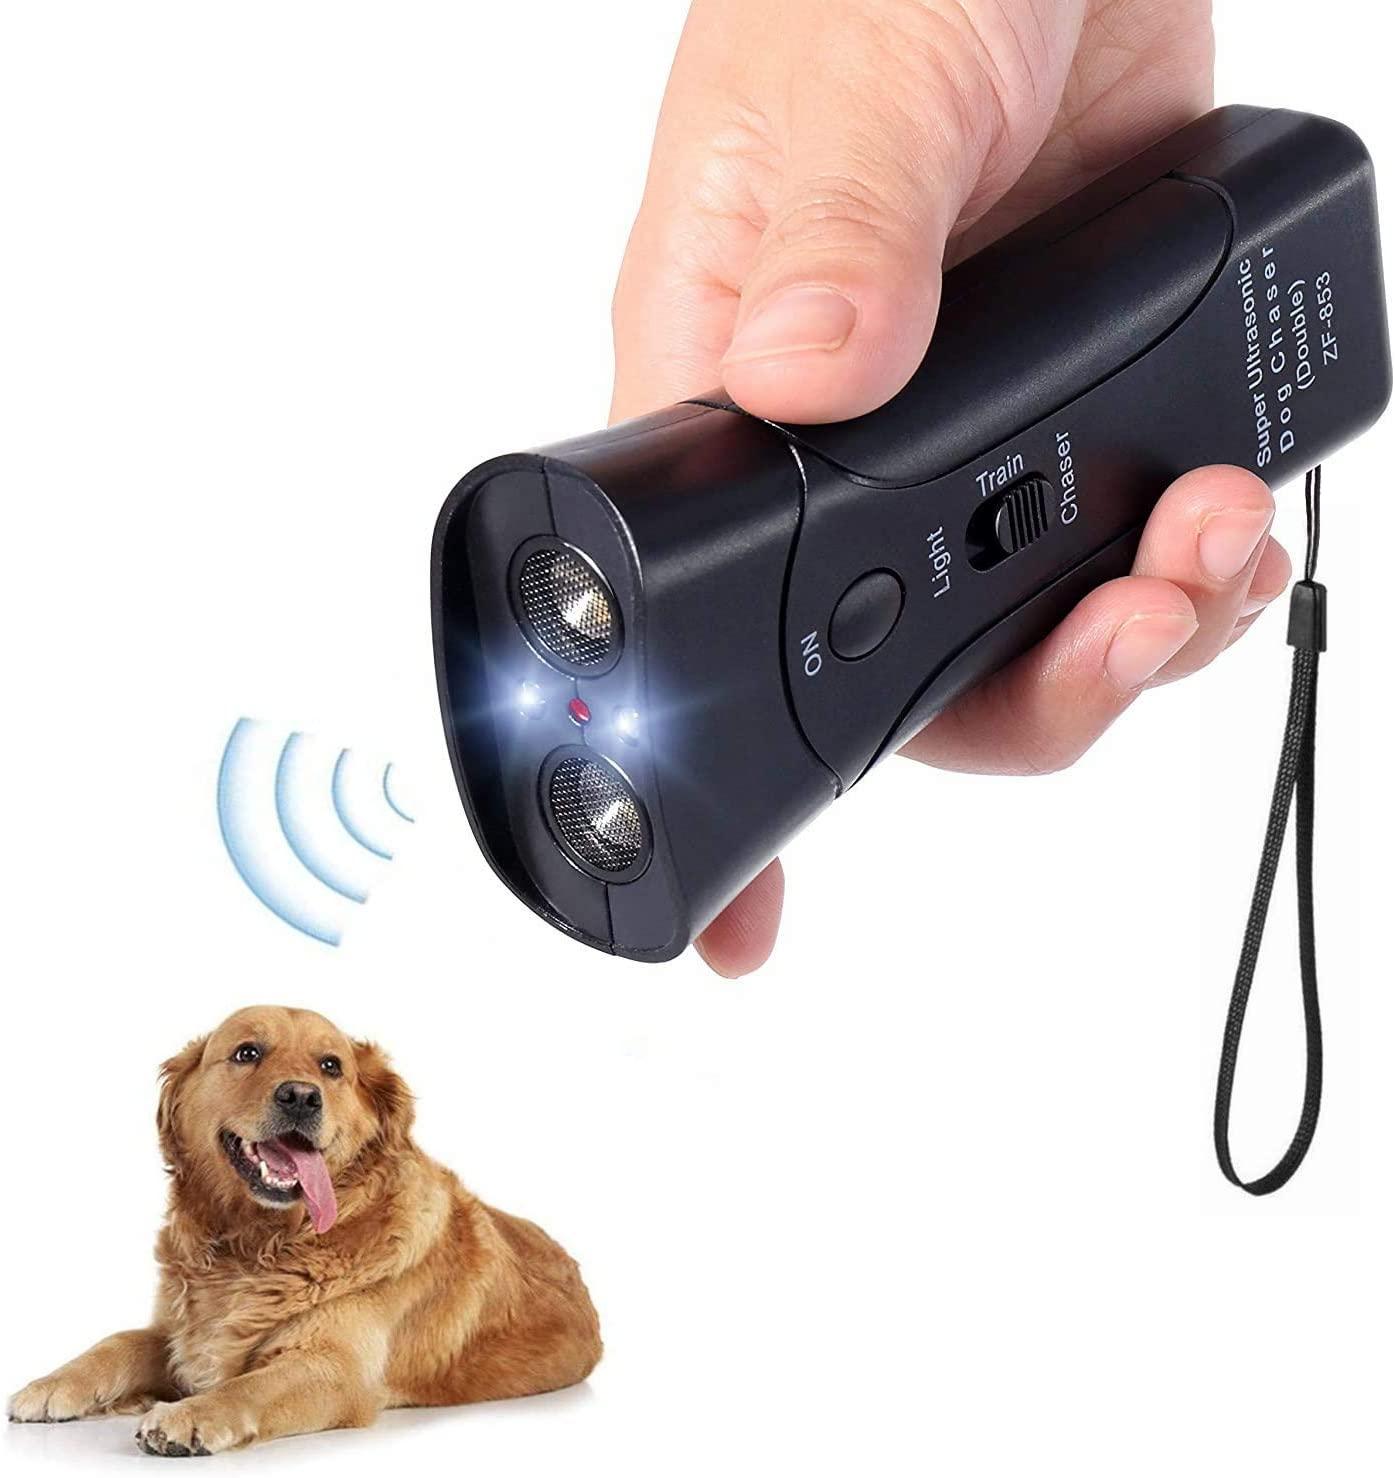 Ultrasonic Pet Dog Stop Barking Away Anti Bark Training Repeller Control Device